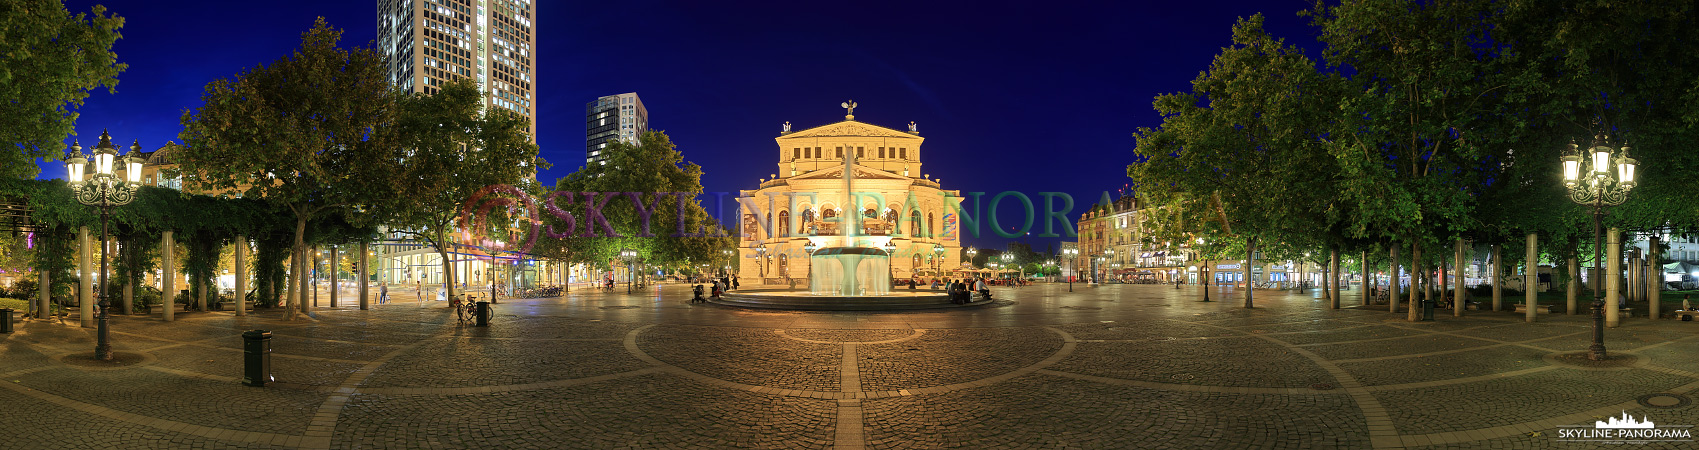 Alte Oper - Frankfurt am Main